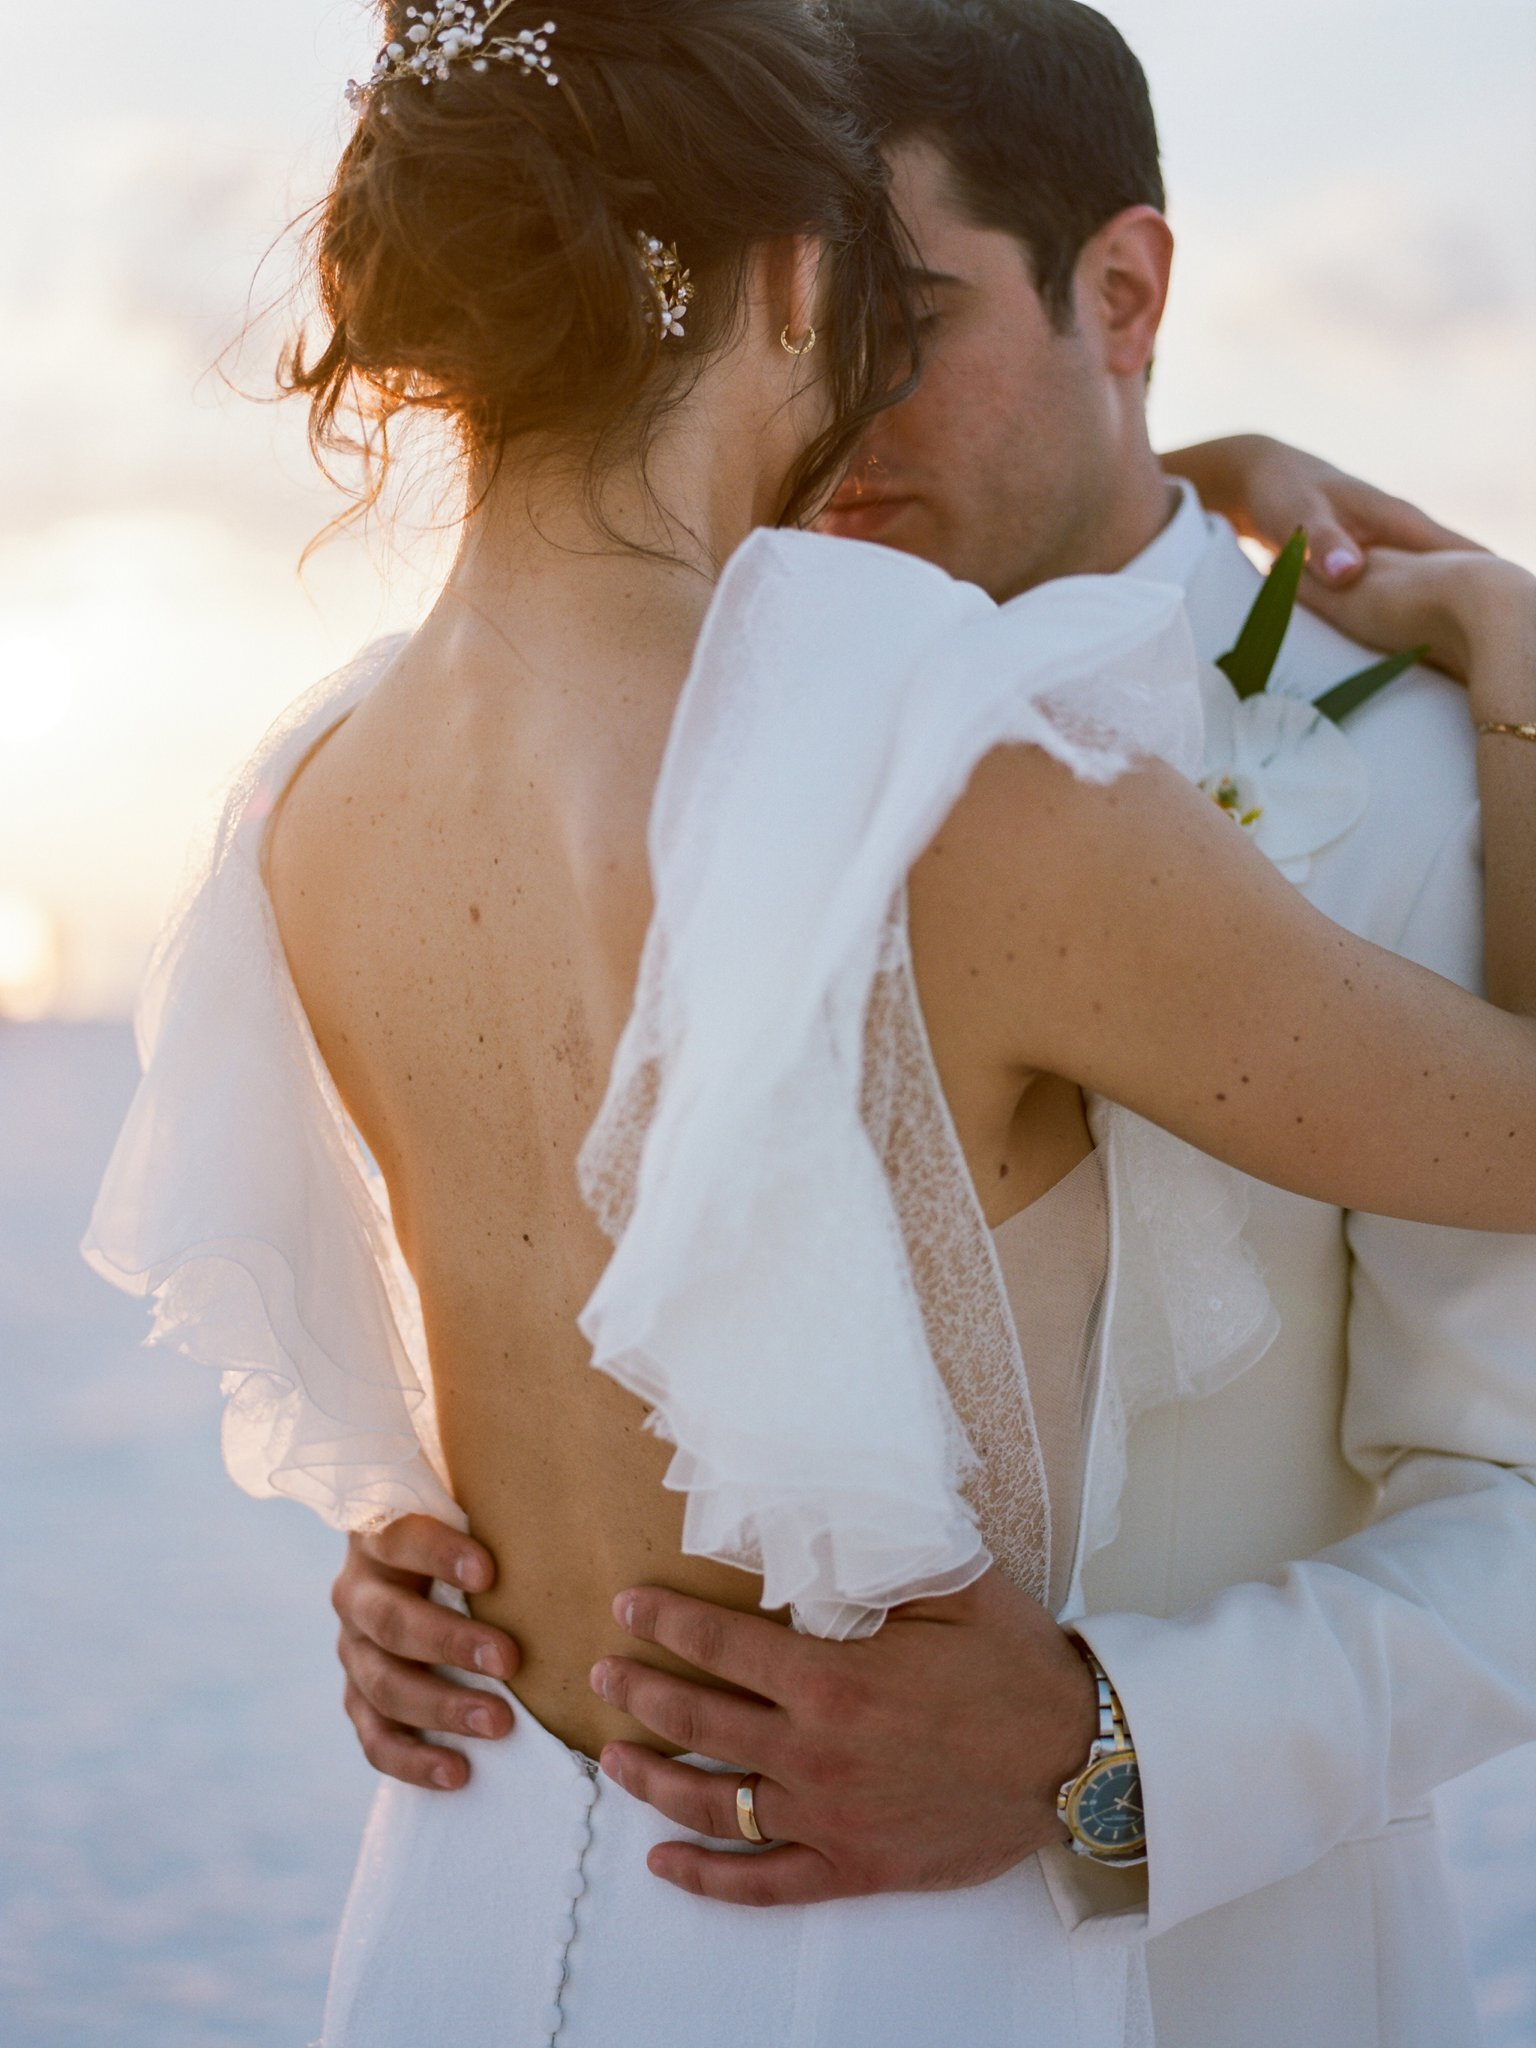 jw marriott marco island wedding photographer marco island wedding photographer shannon griffin photography_0211.jpg